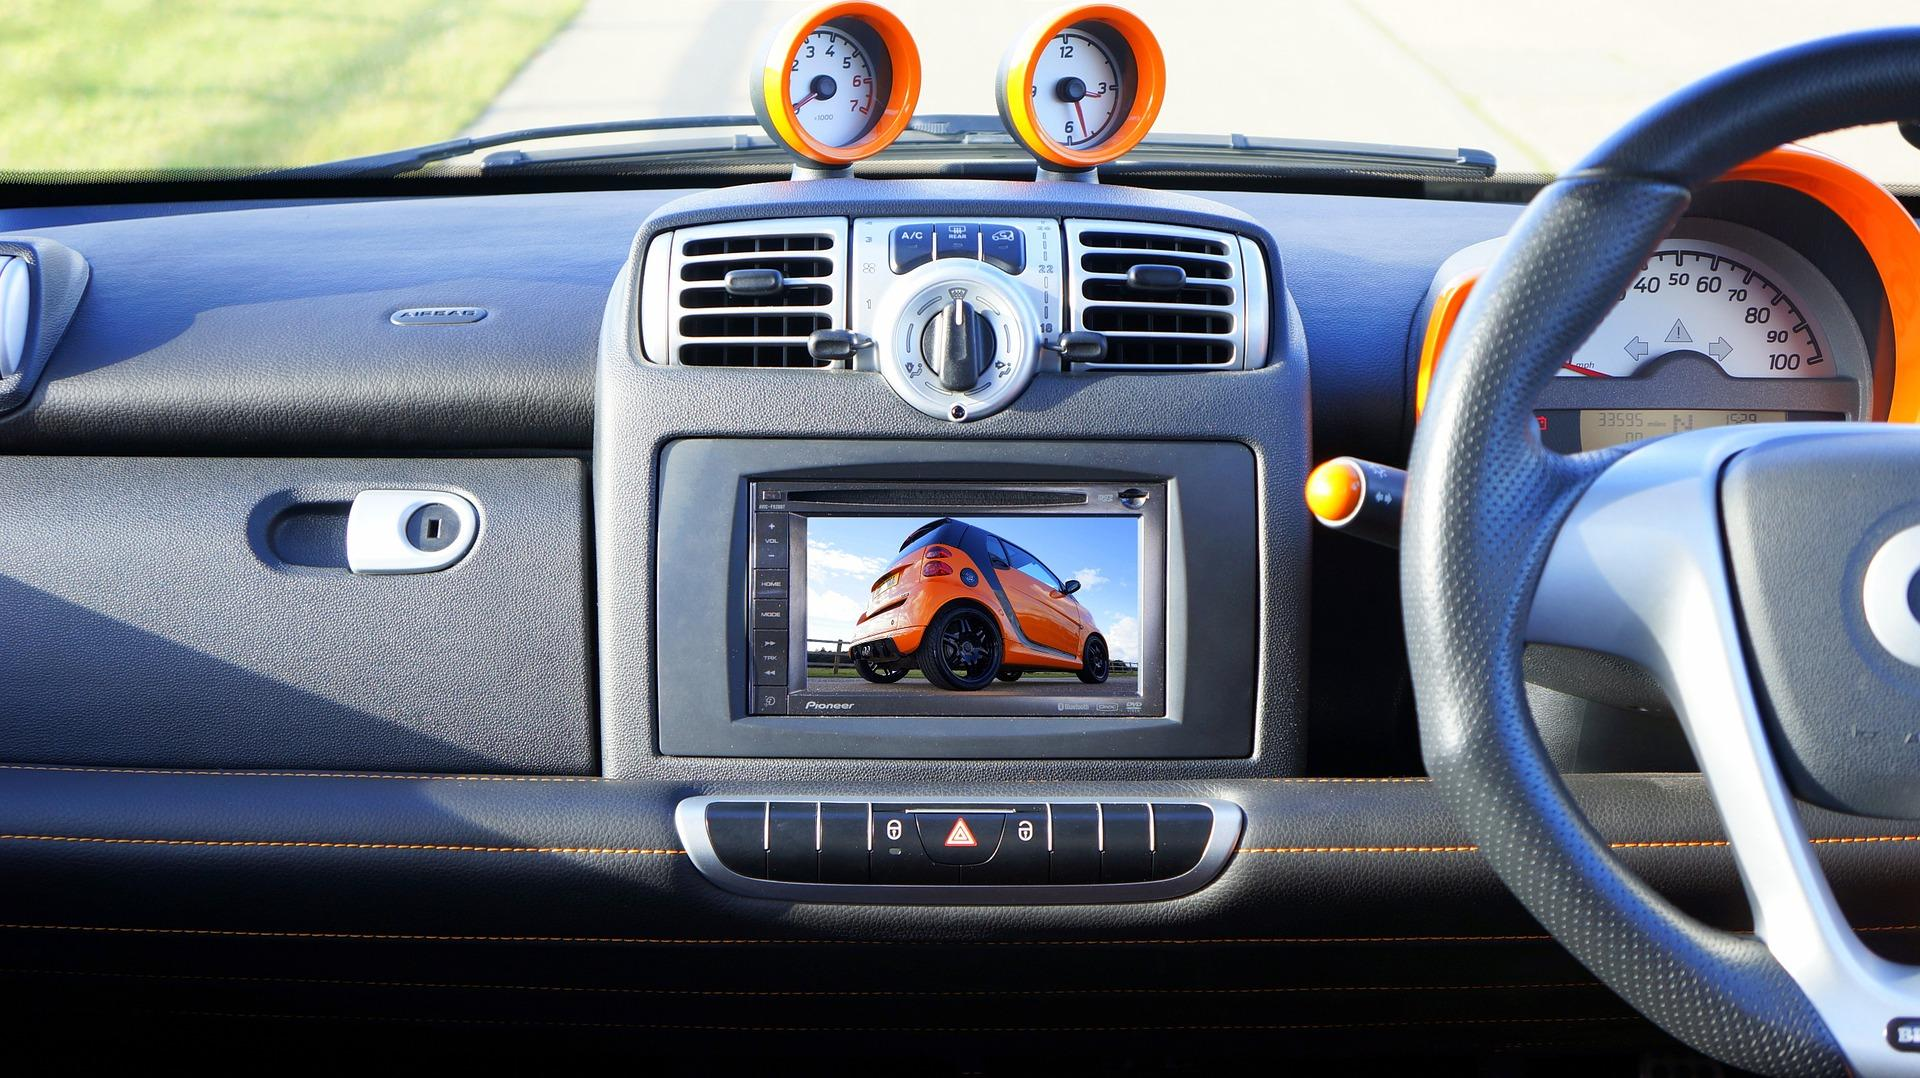 uploads///smart car _